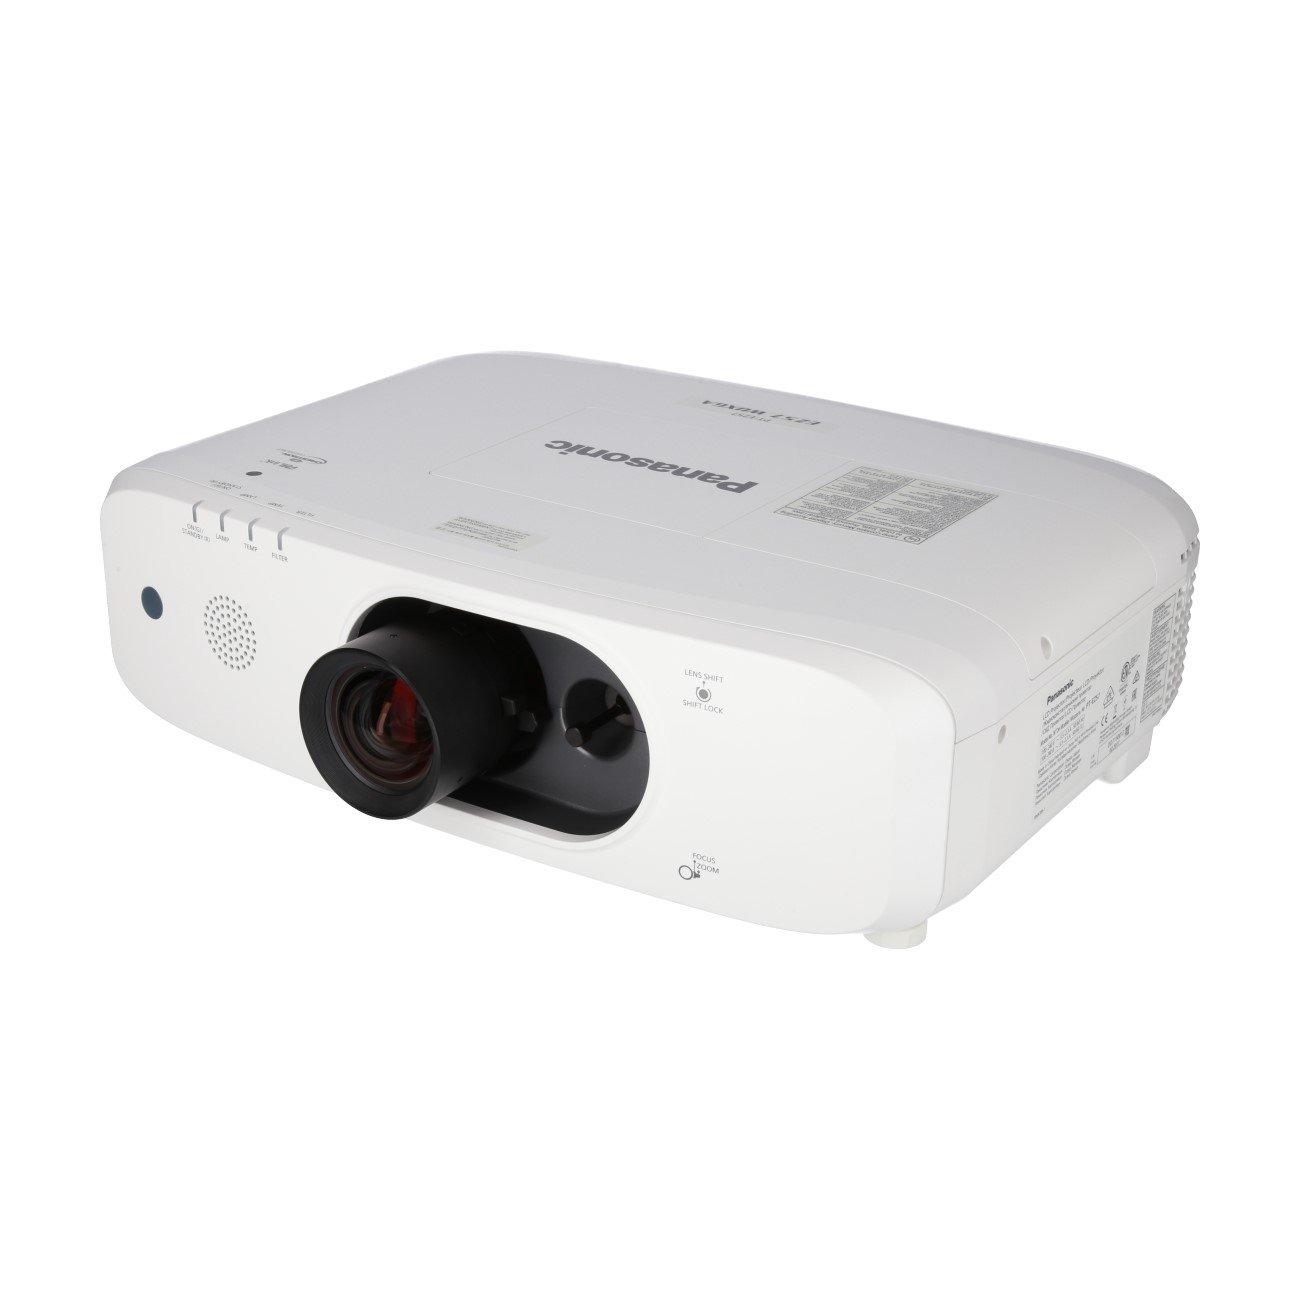 Projectors 3LCD WUXGA 5000 ANSI Lumens Projector